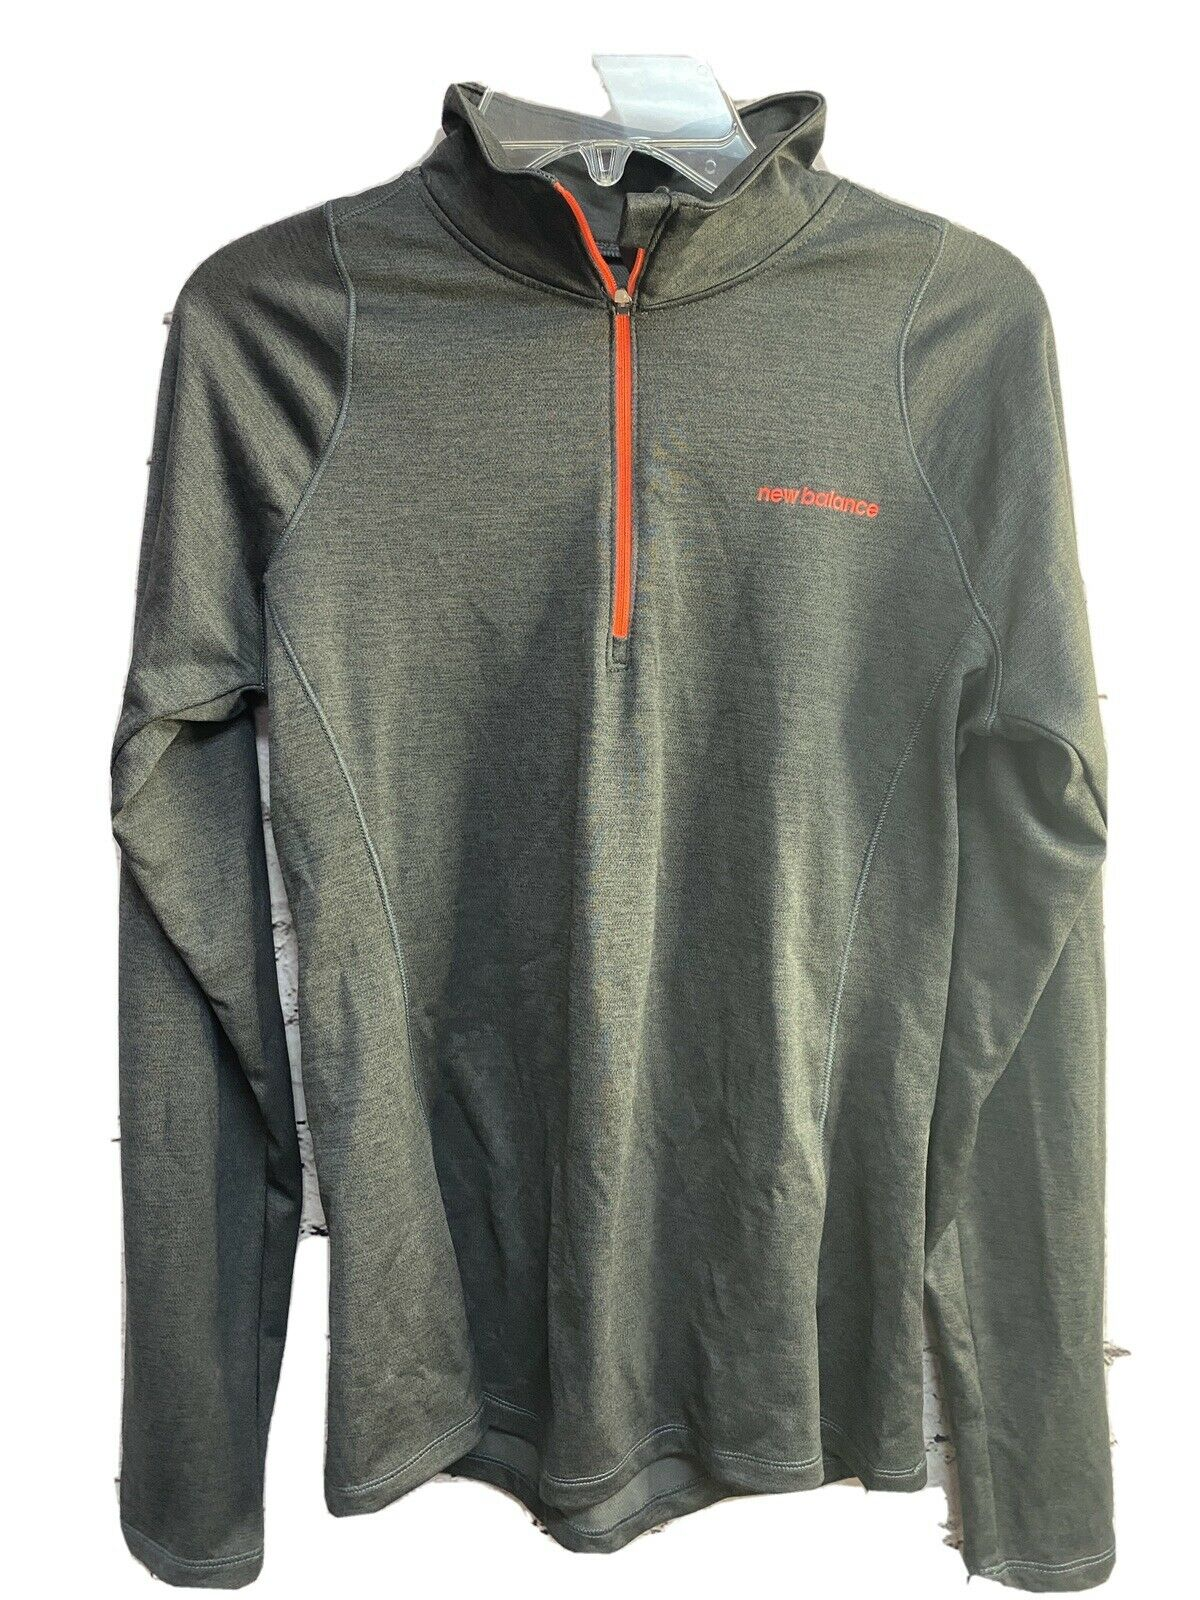 New Balance Women's Athletic Top Gray/Neon Orange Long Sleeve Half Zip Sz S